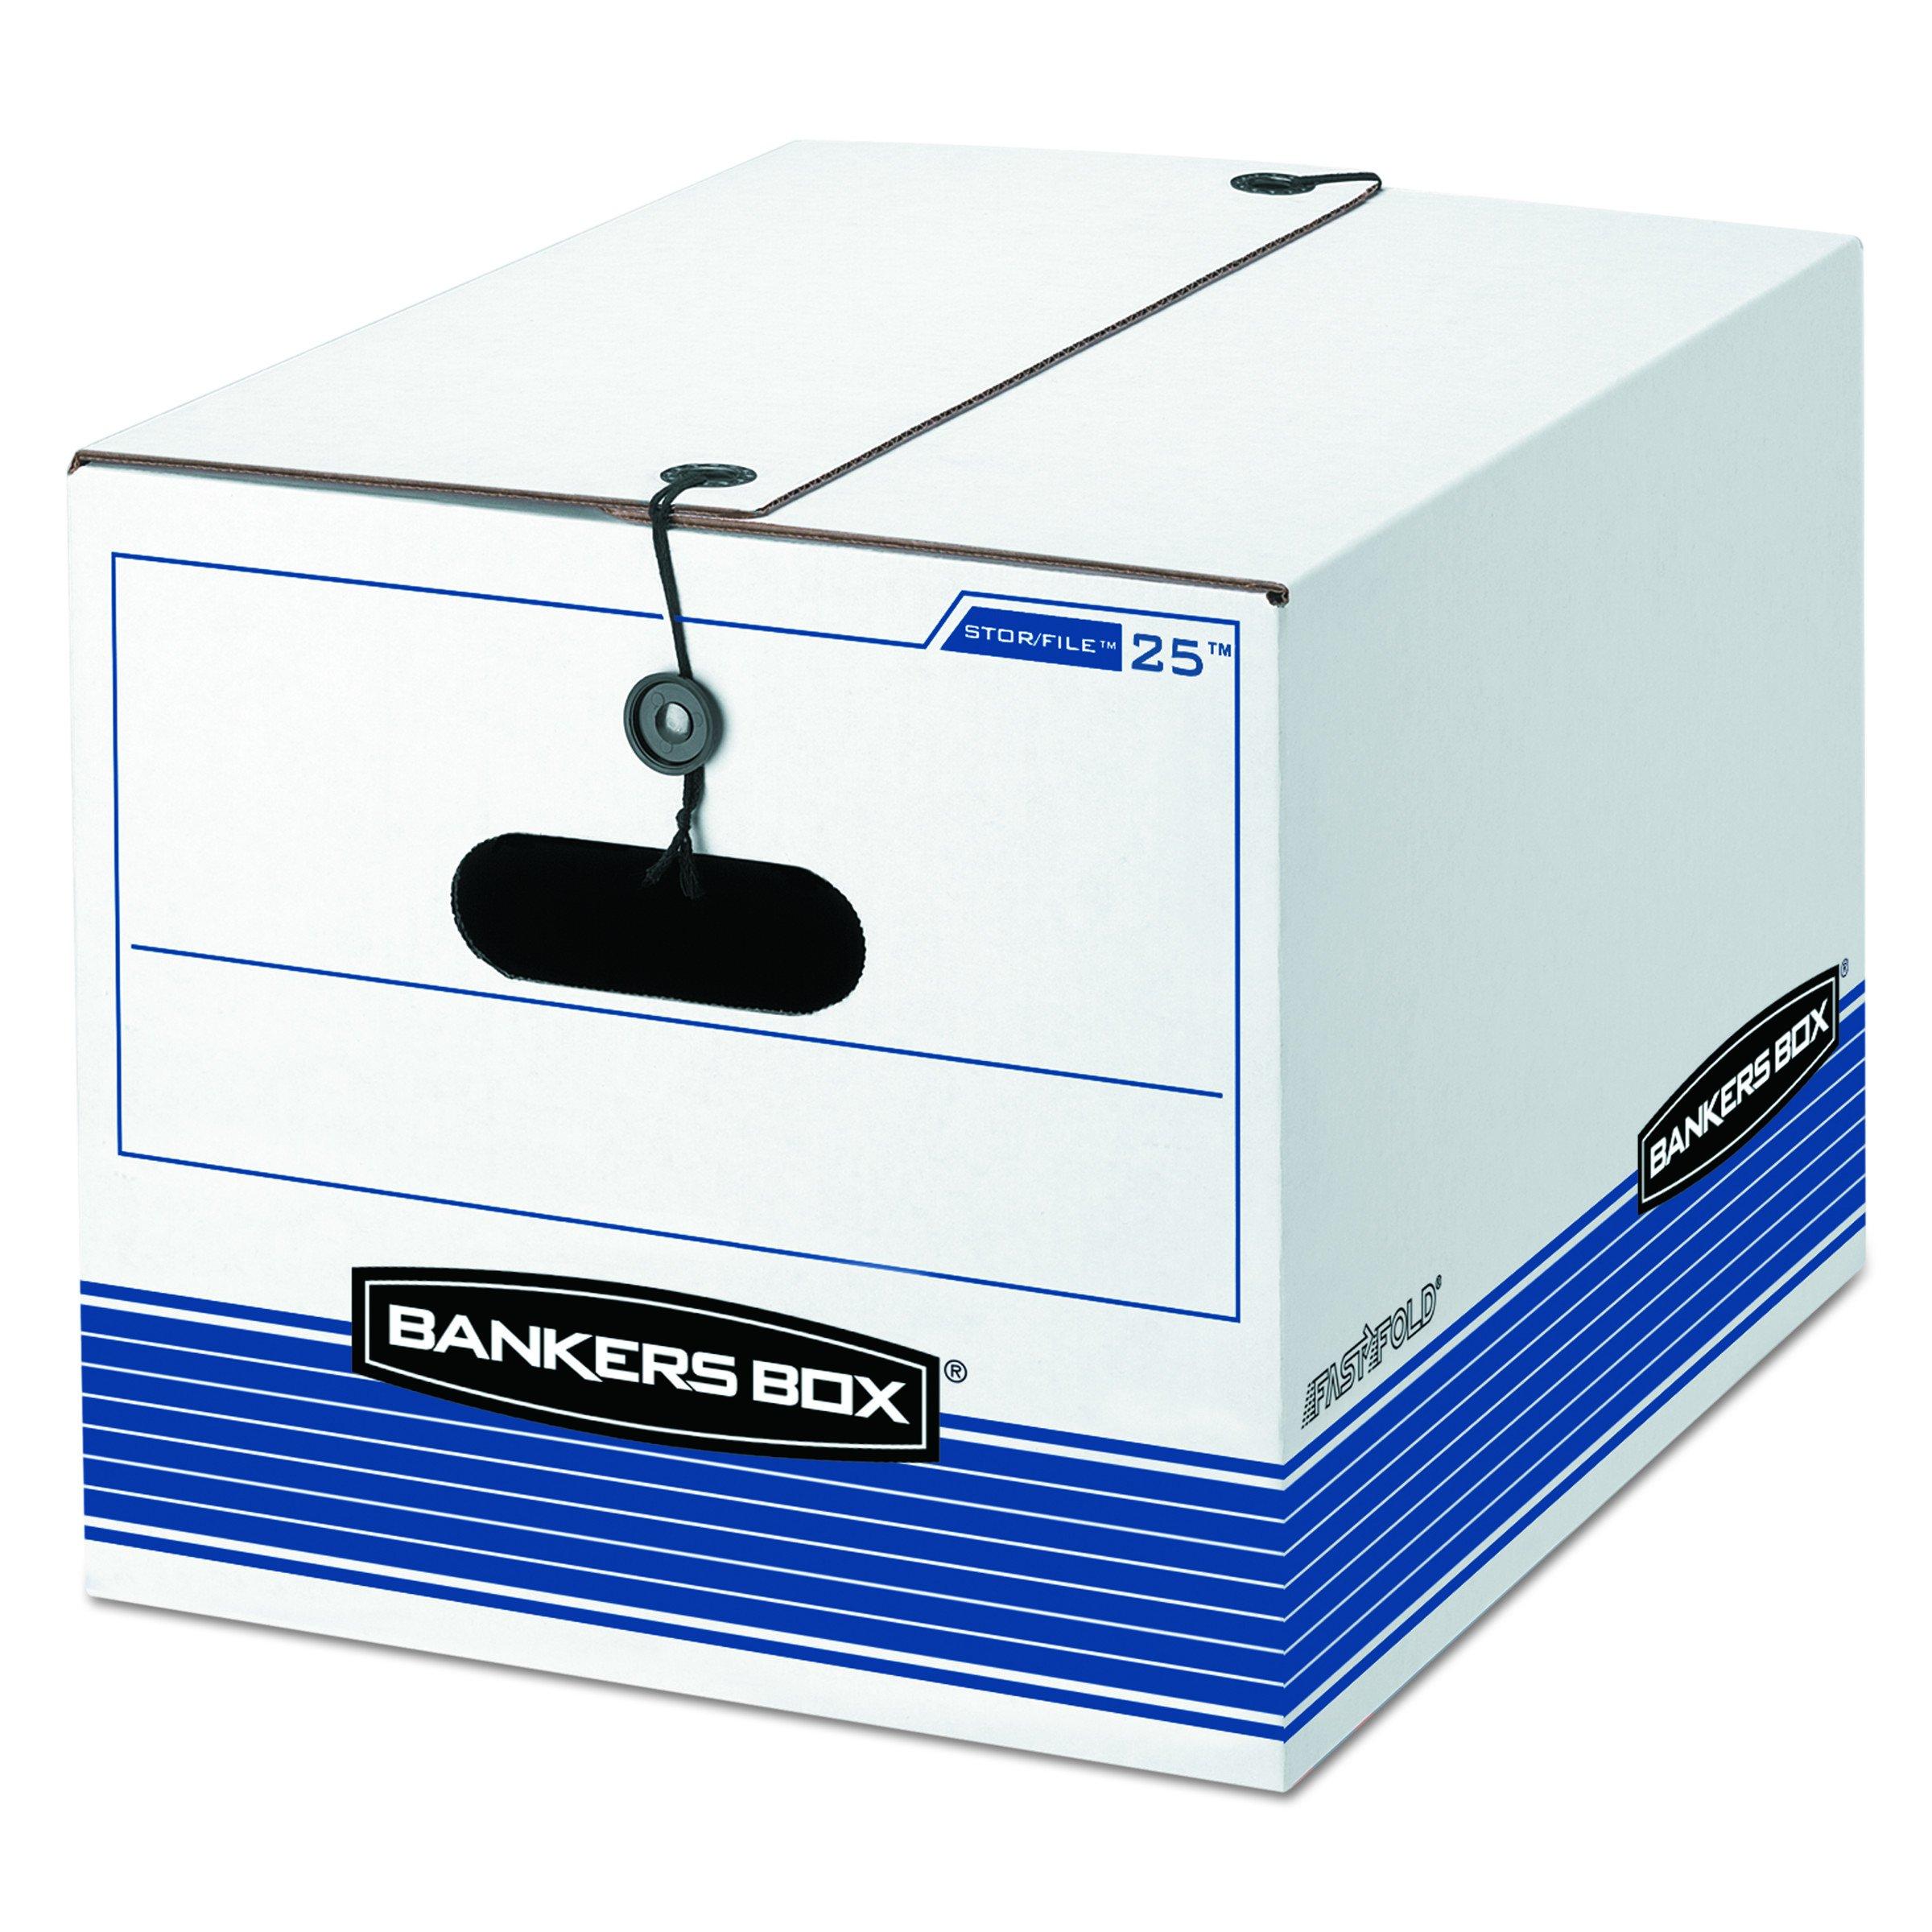 Bankers Box 0002501 Storage Box, Legal/Letter, Tie Closure, White/Blue, 4/Carton